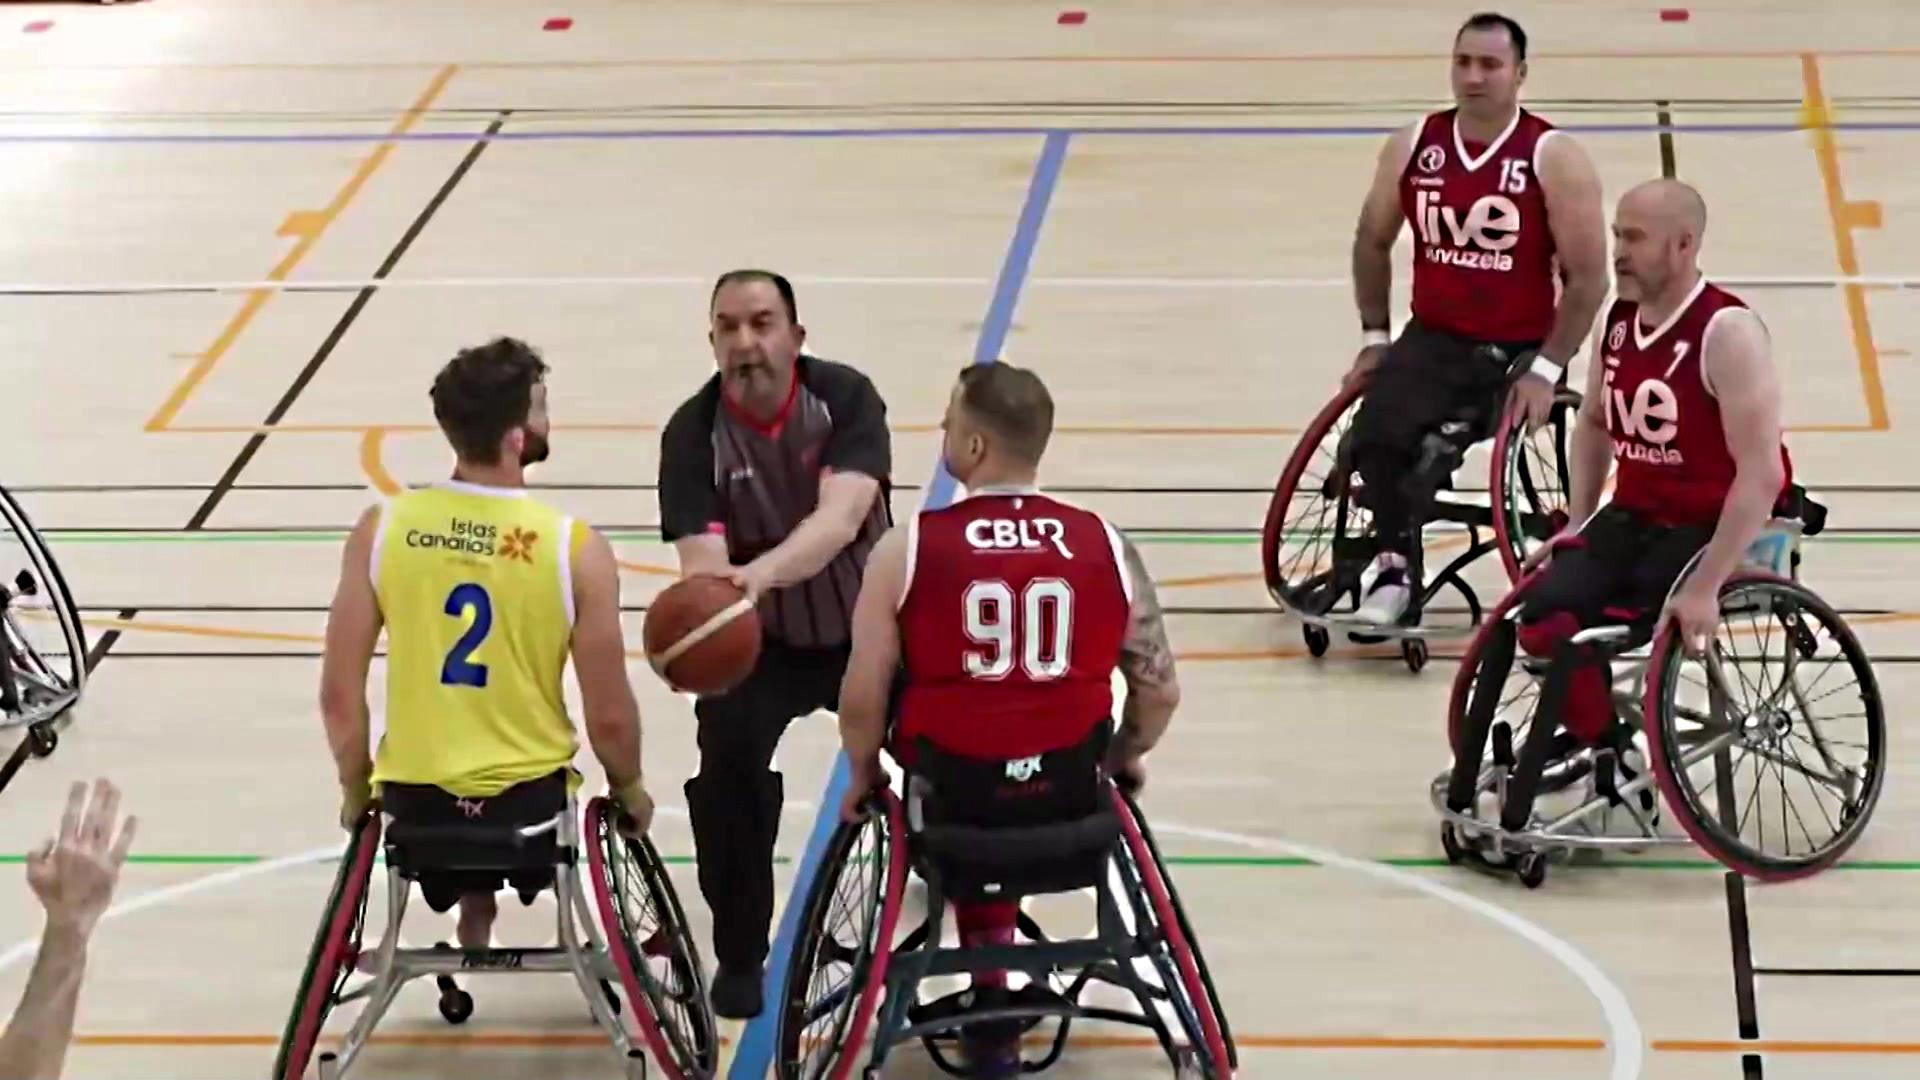 Baloncesto en silla de ruedas - Liga BSR División honor. Resumen jornada 20